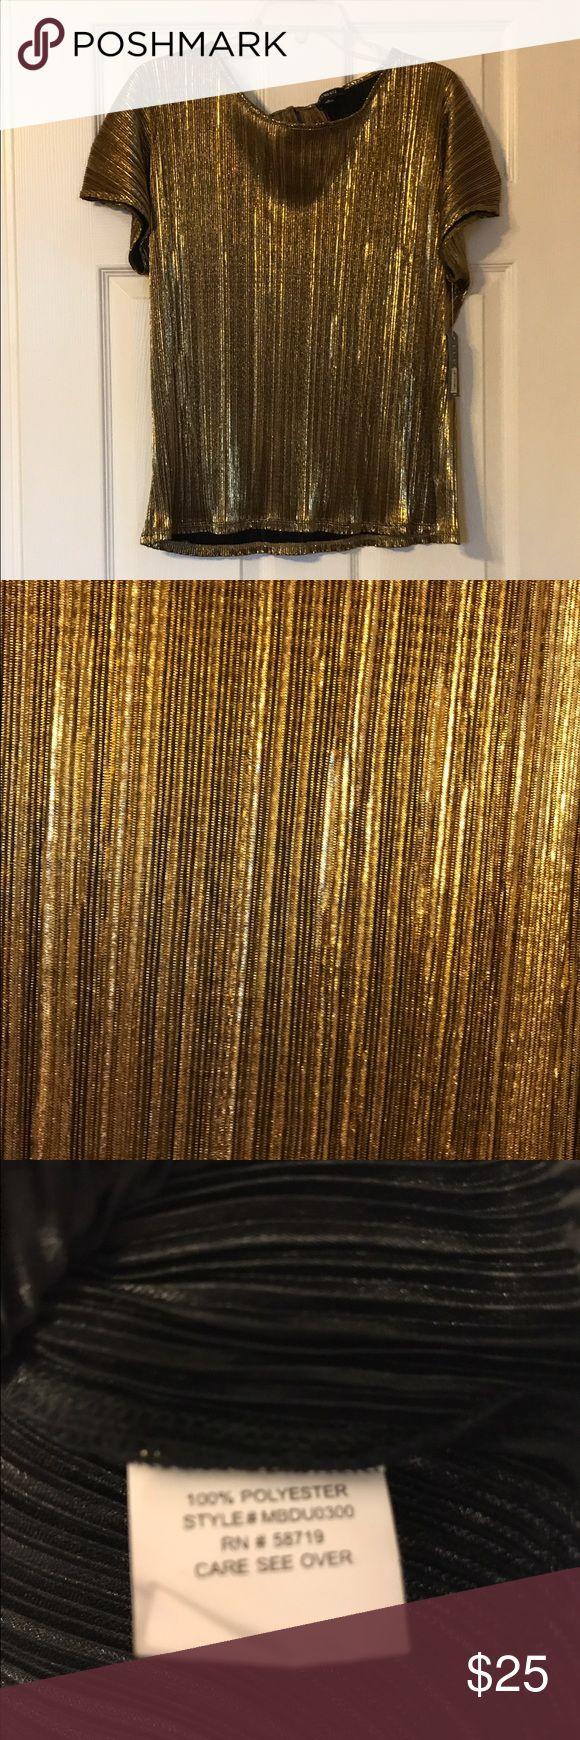 NWOT metallic gold short sleeve blouse-Large NWOT metallic gold short sleeve blouse-Large Tops Blouses